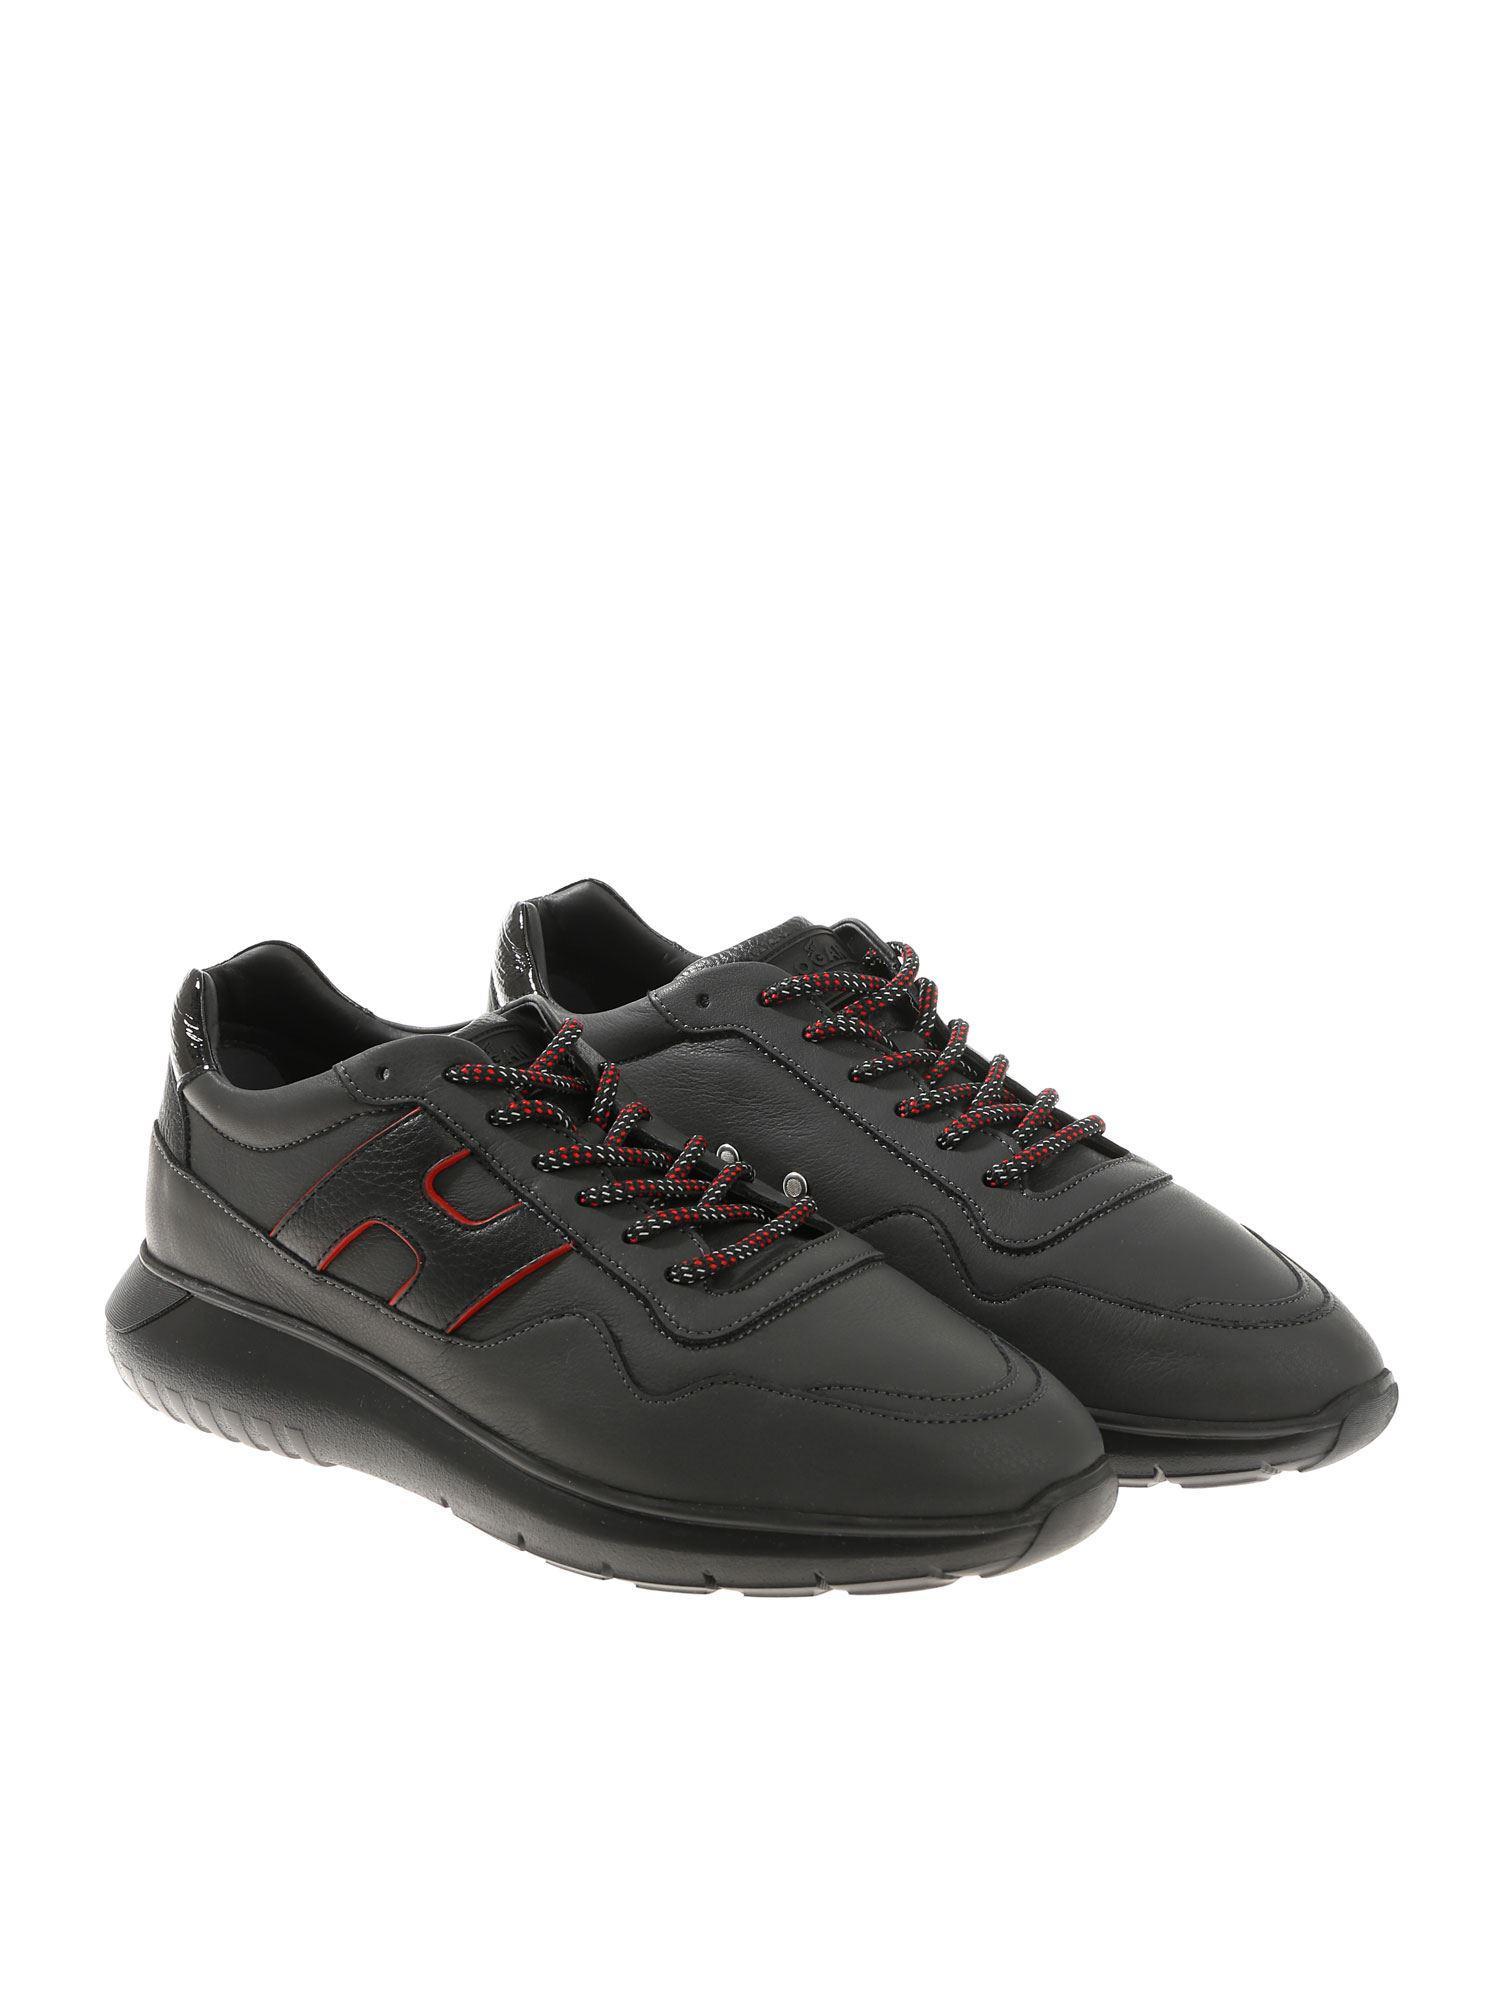 9636f1b34ca Hogan - Black Interactive 3 Sneakers for Men - Lyst. View fullscreen